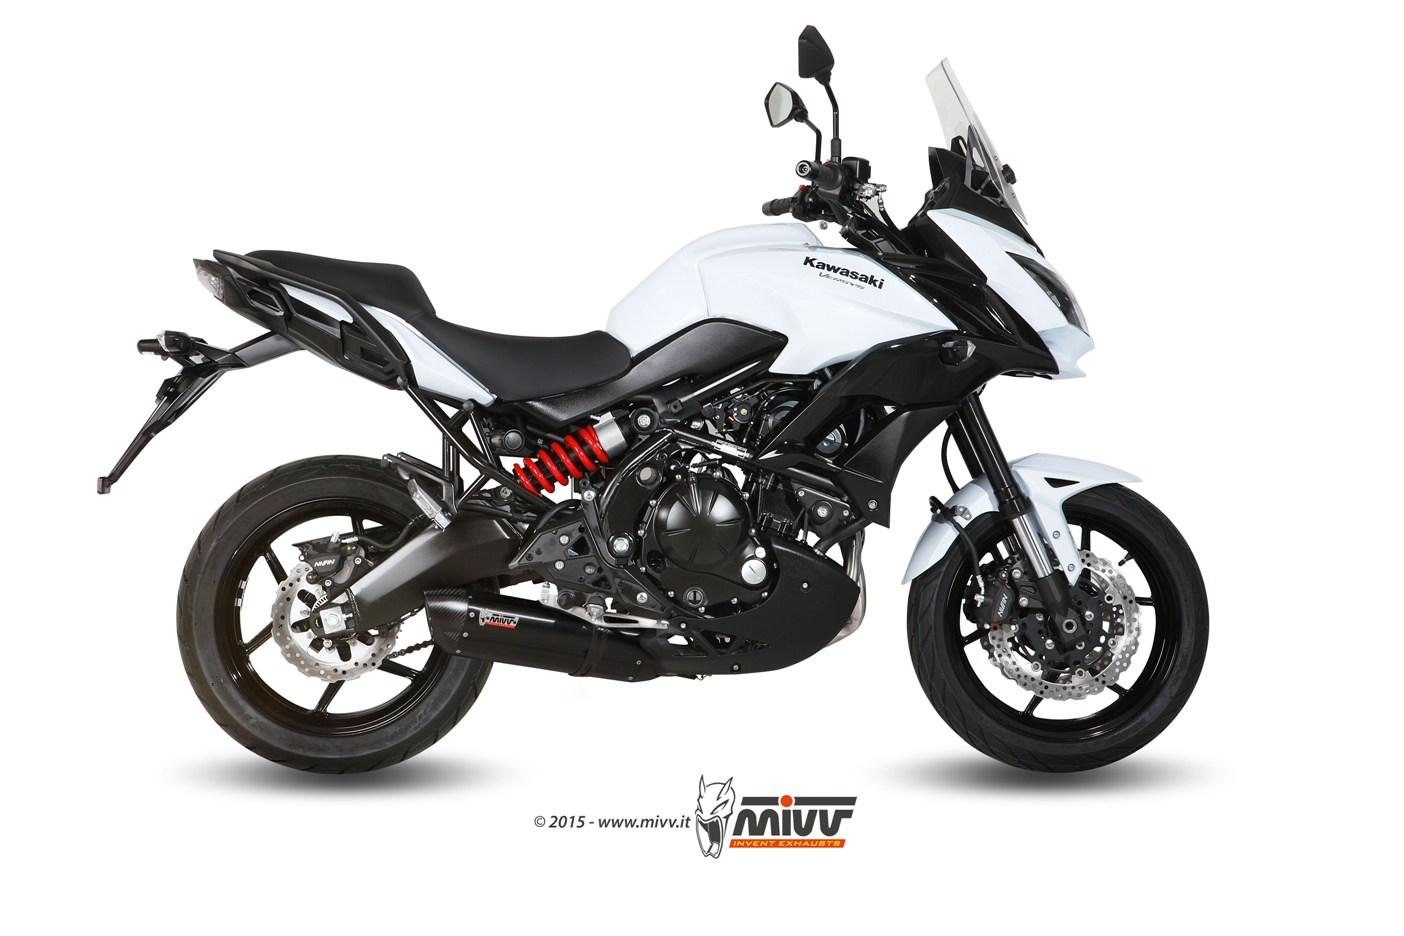 Escape completo homologado Mivv Suono Acero negro para Kawasaki Versys 650 15-20